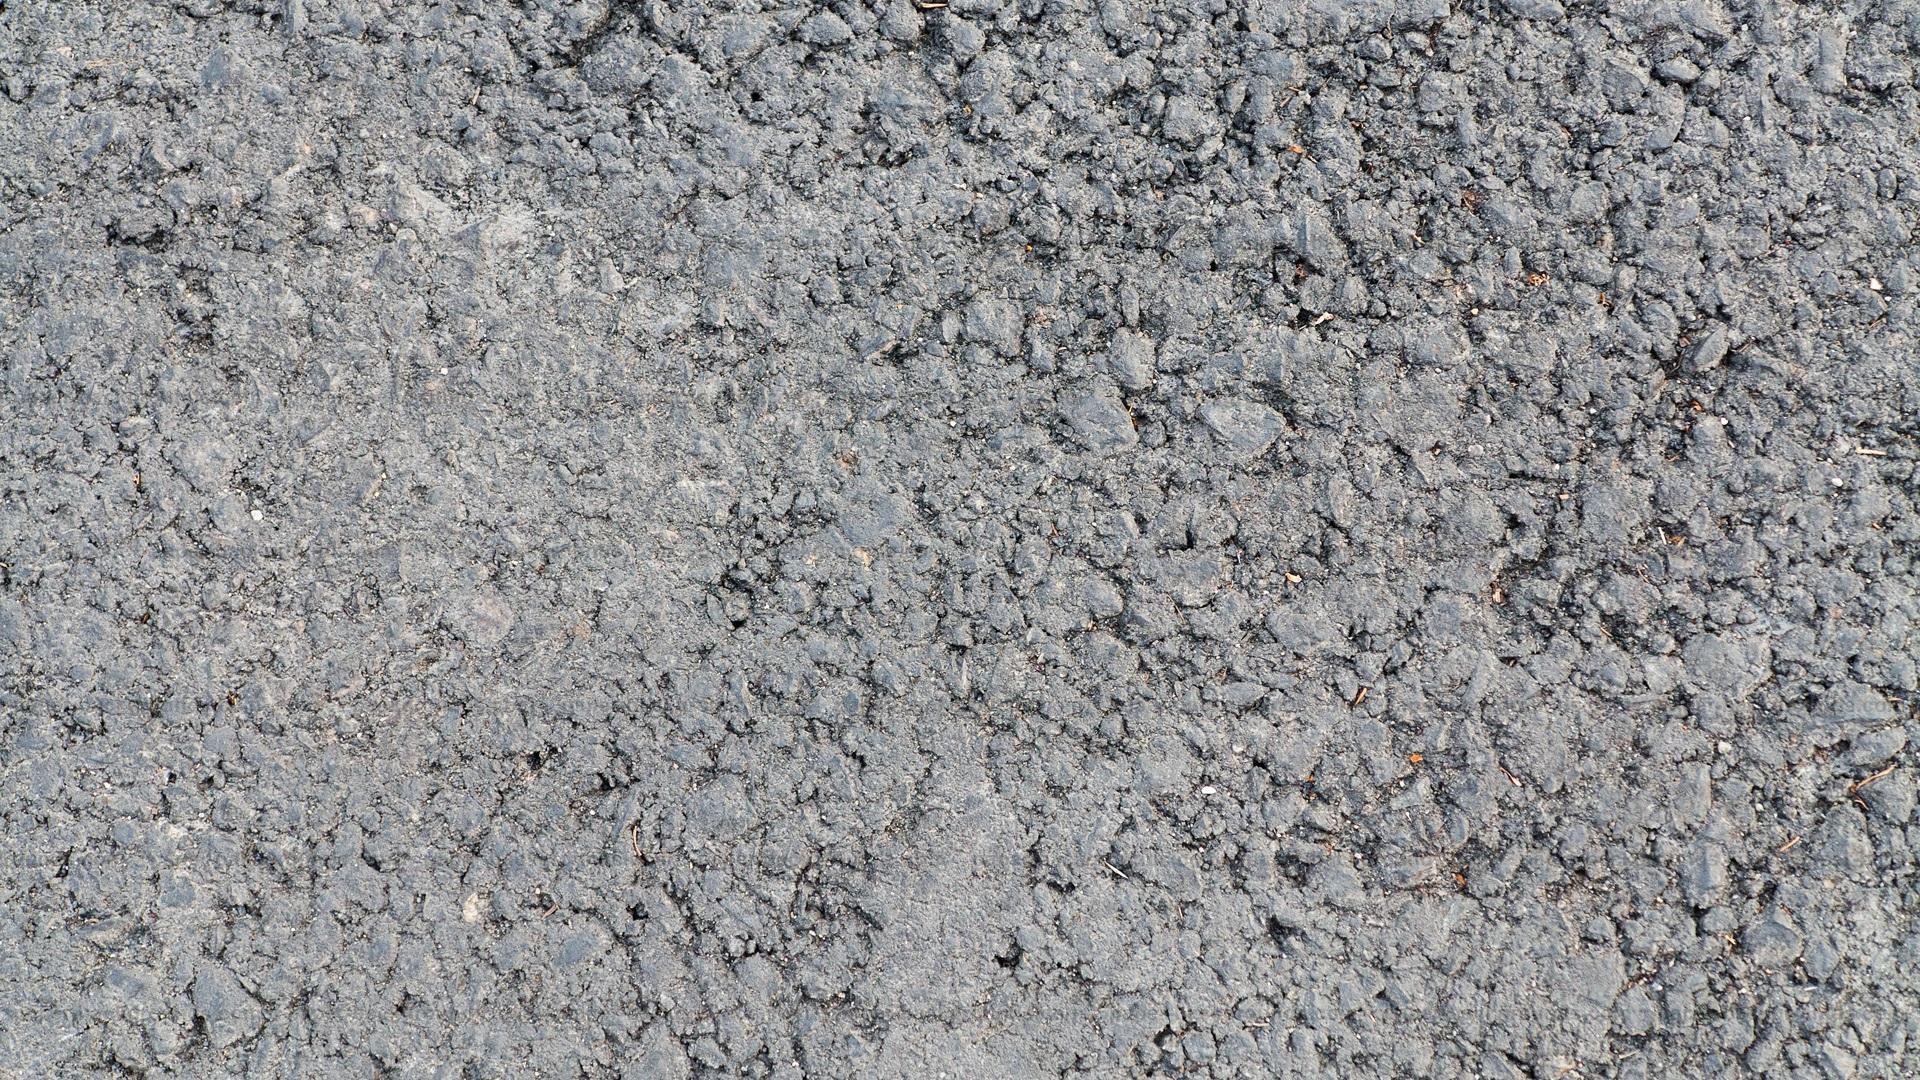 Rough Texture Background: Free Photo: Rough Concrete Surface